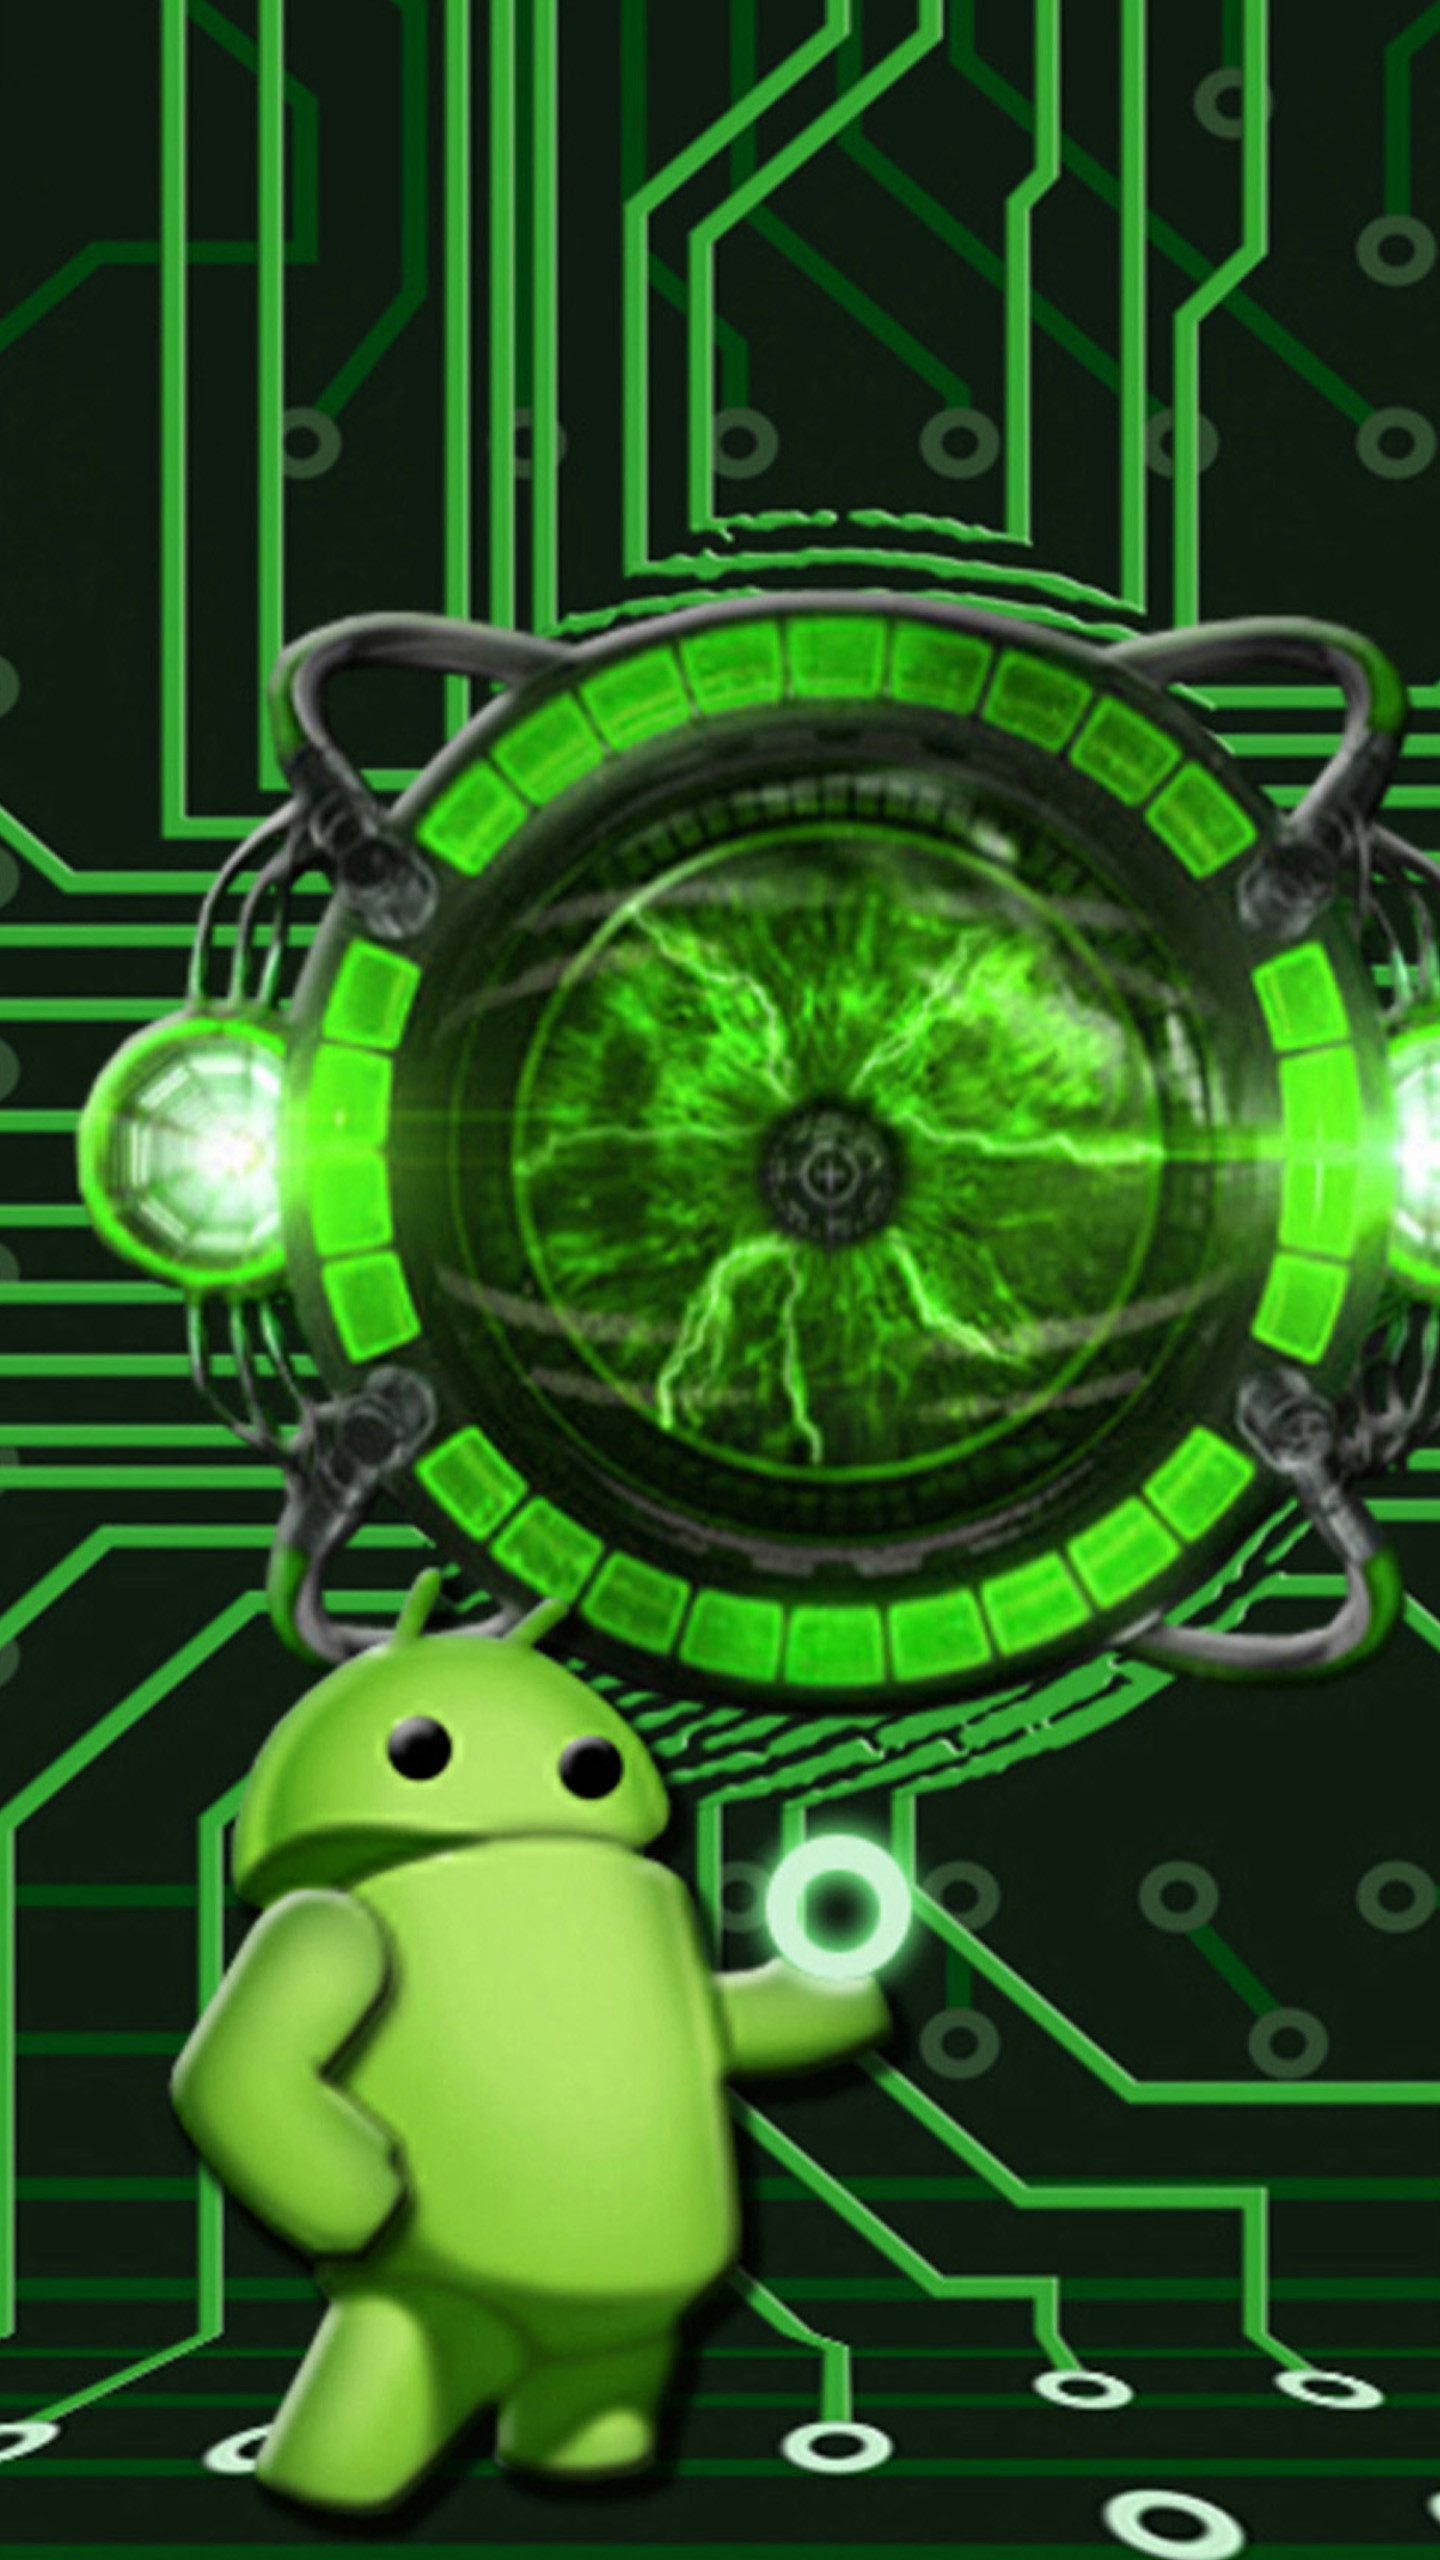 Android Samsung Galaxy S6 Wallpaper 54